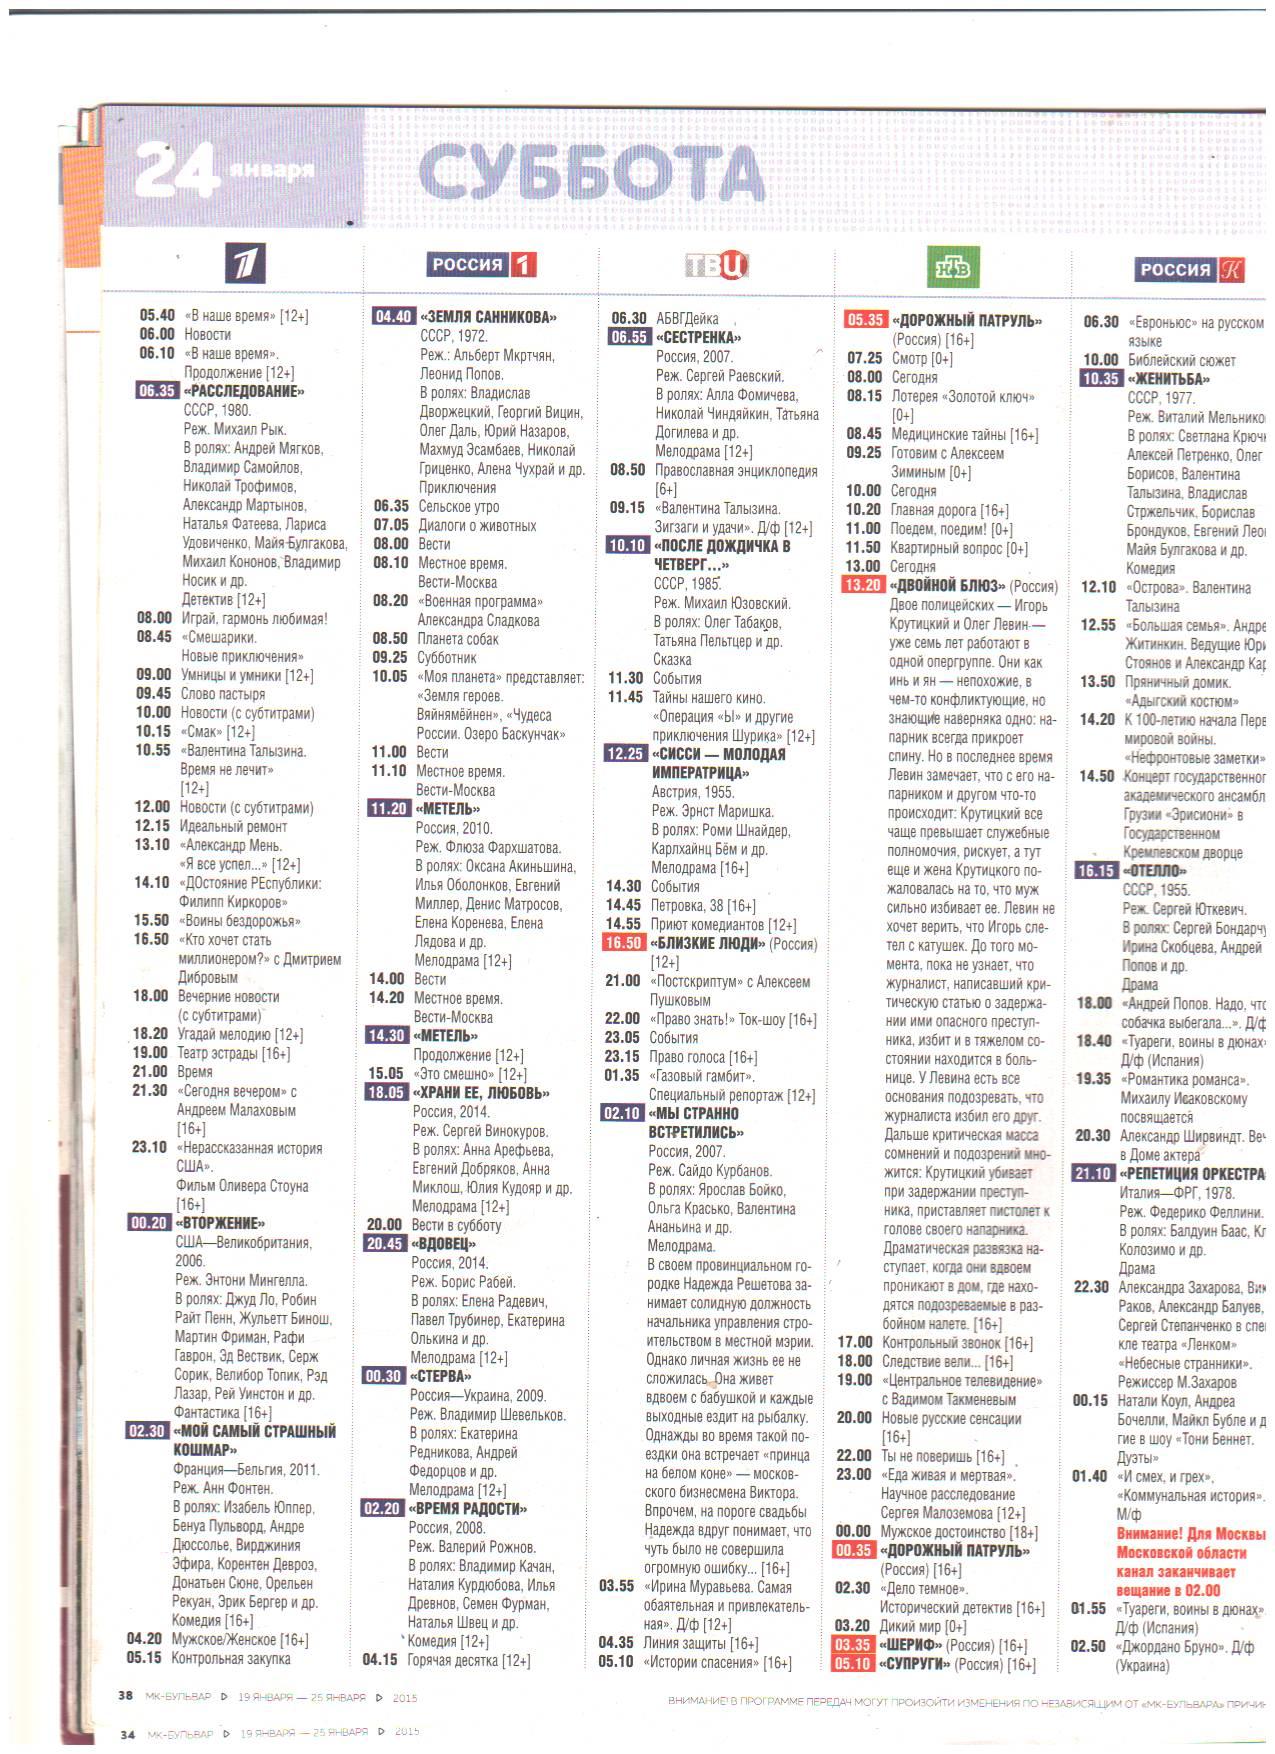 Прогноз и ставки на теннисный матч Сурадж Прабодх (Инд) — Сурай Бенивал (Инд) 25.11.15